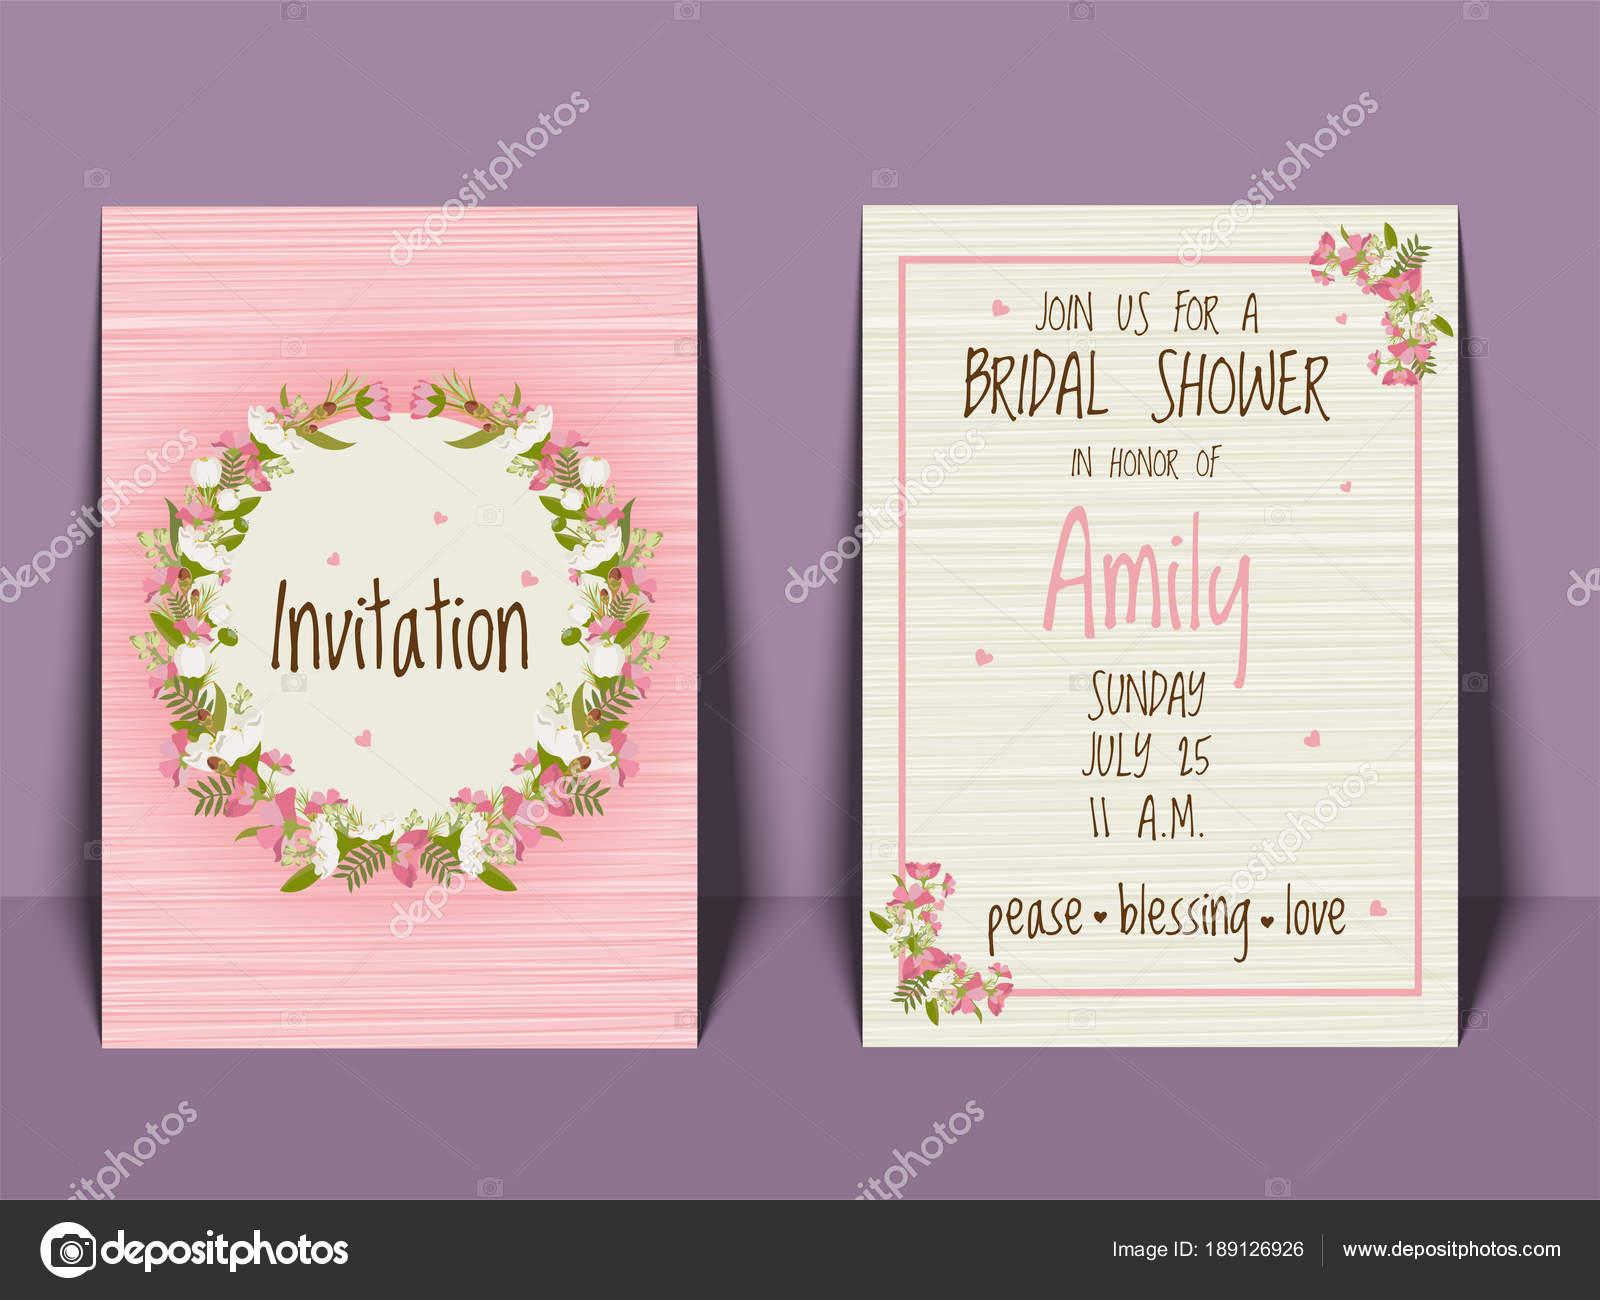 Bridal shower invitation card templates. — Vector by alliesinteract